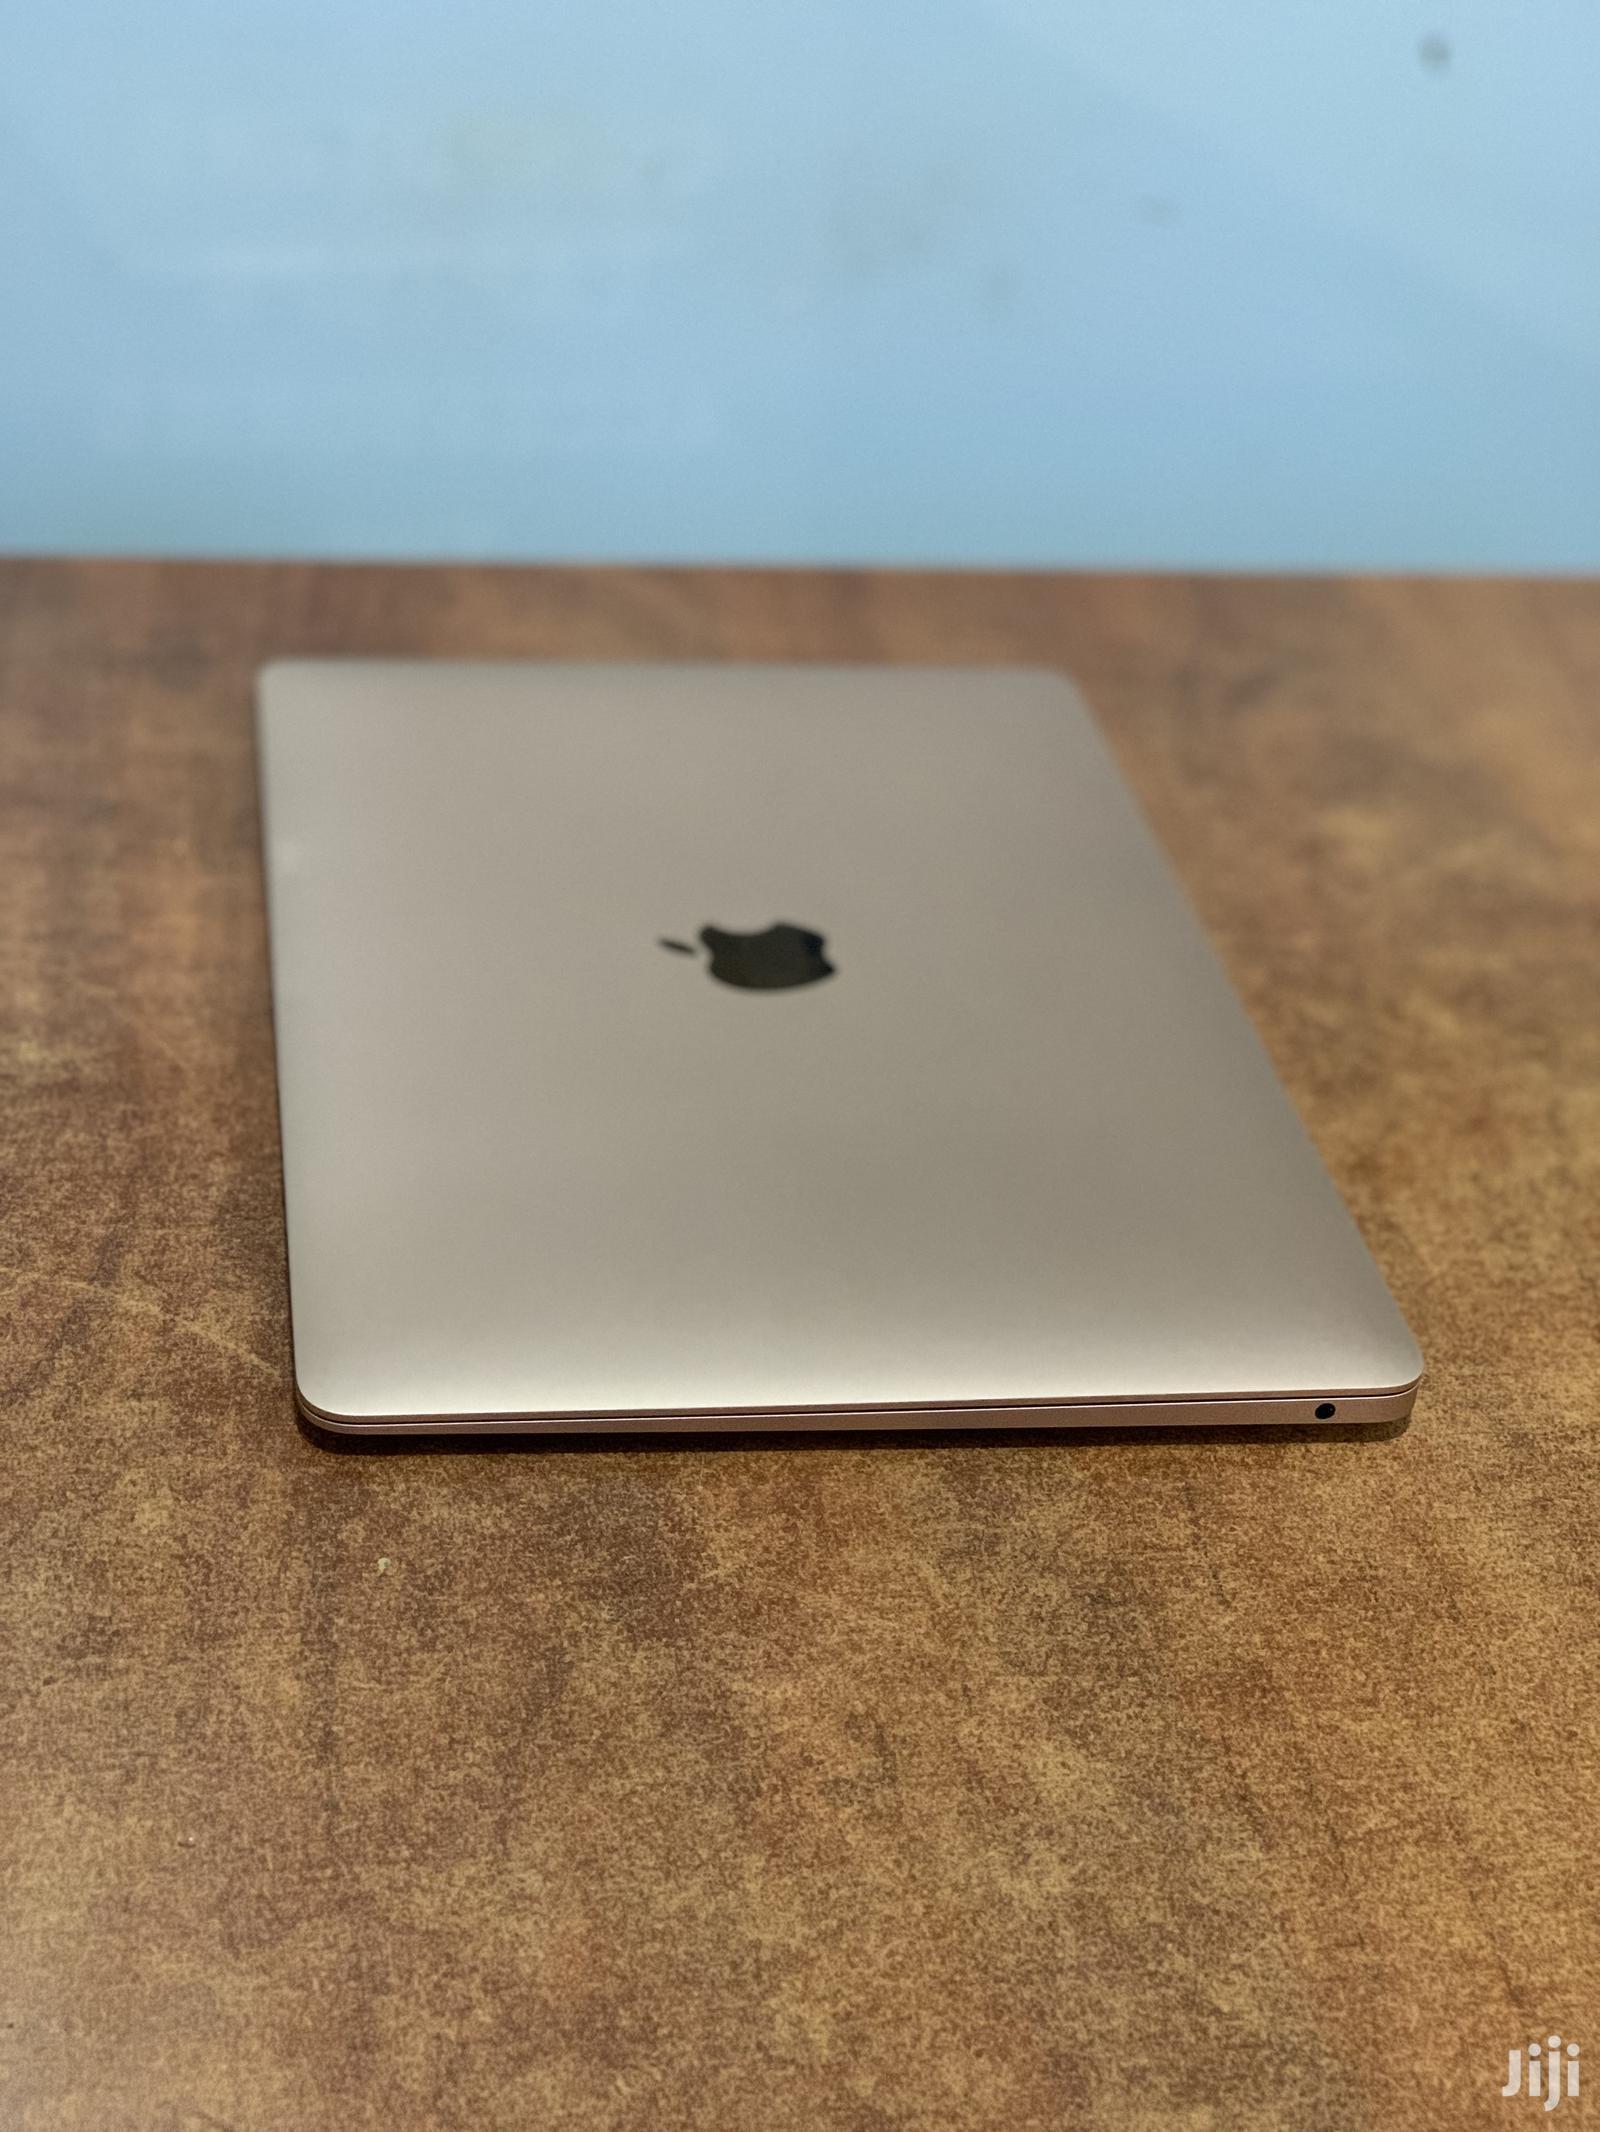 Laptop Apple MacBook Air 8GB Intel Core I5 SSHD (Hybrid) 256GB | Laptops & Computers for sale in Kampala, Central Region, Uganda